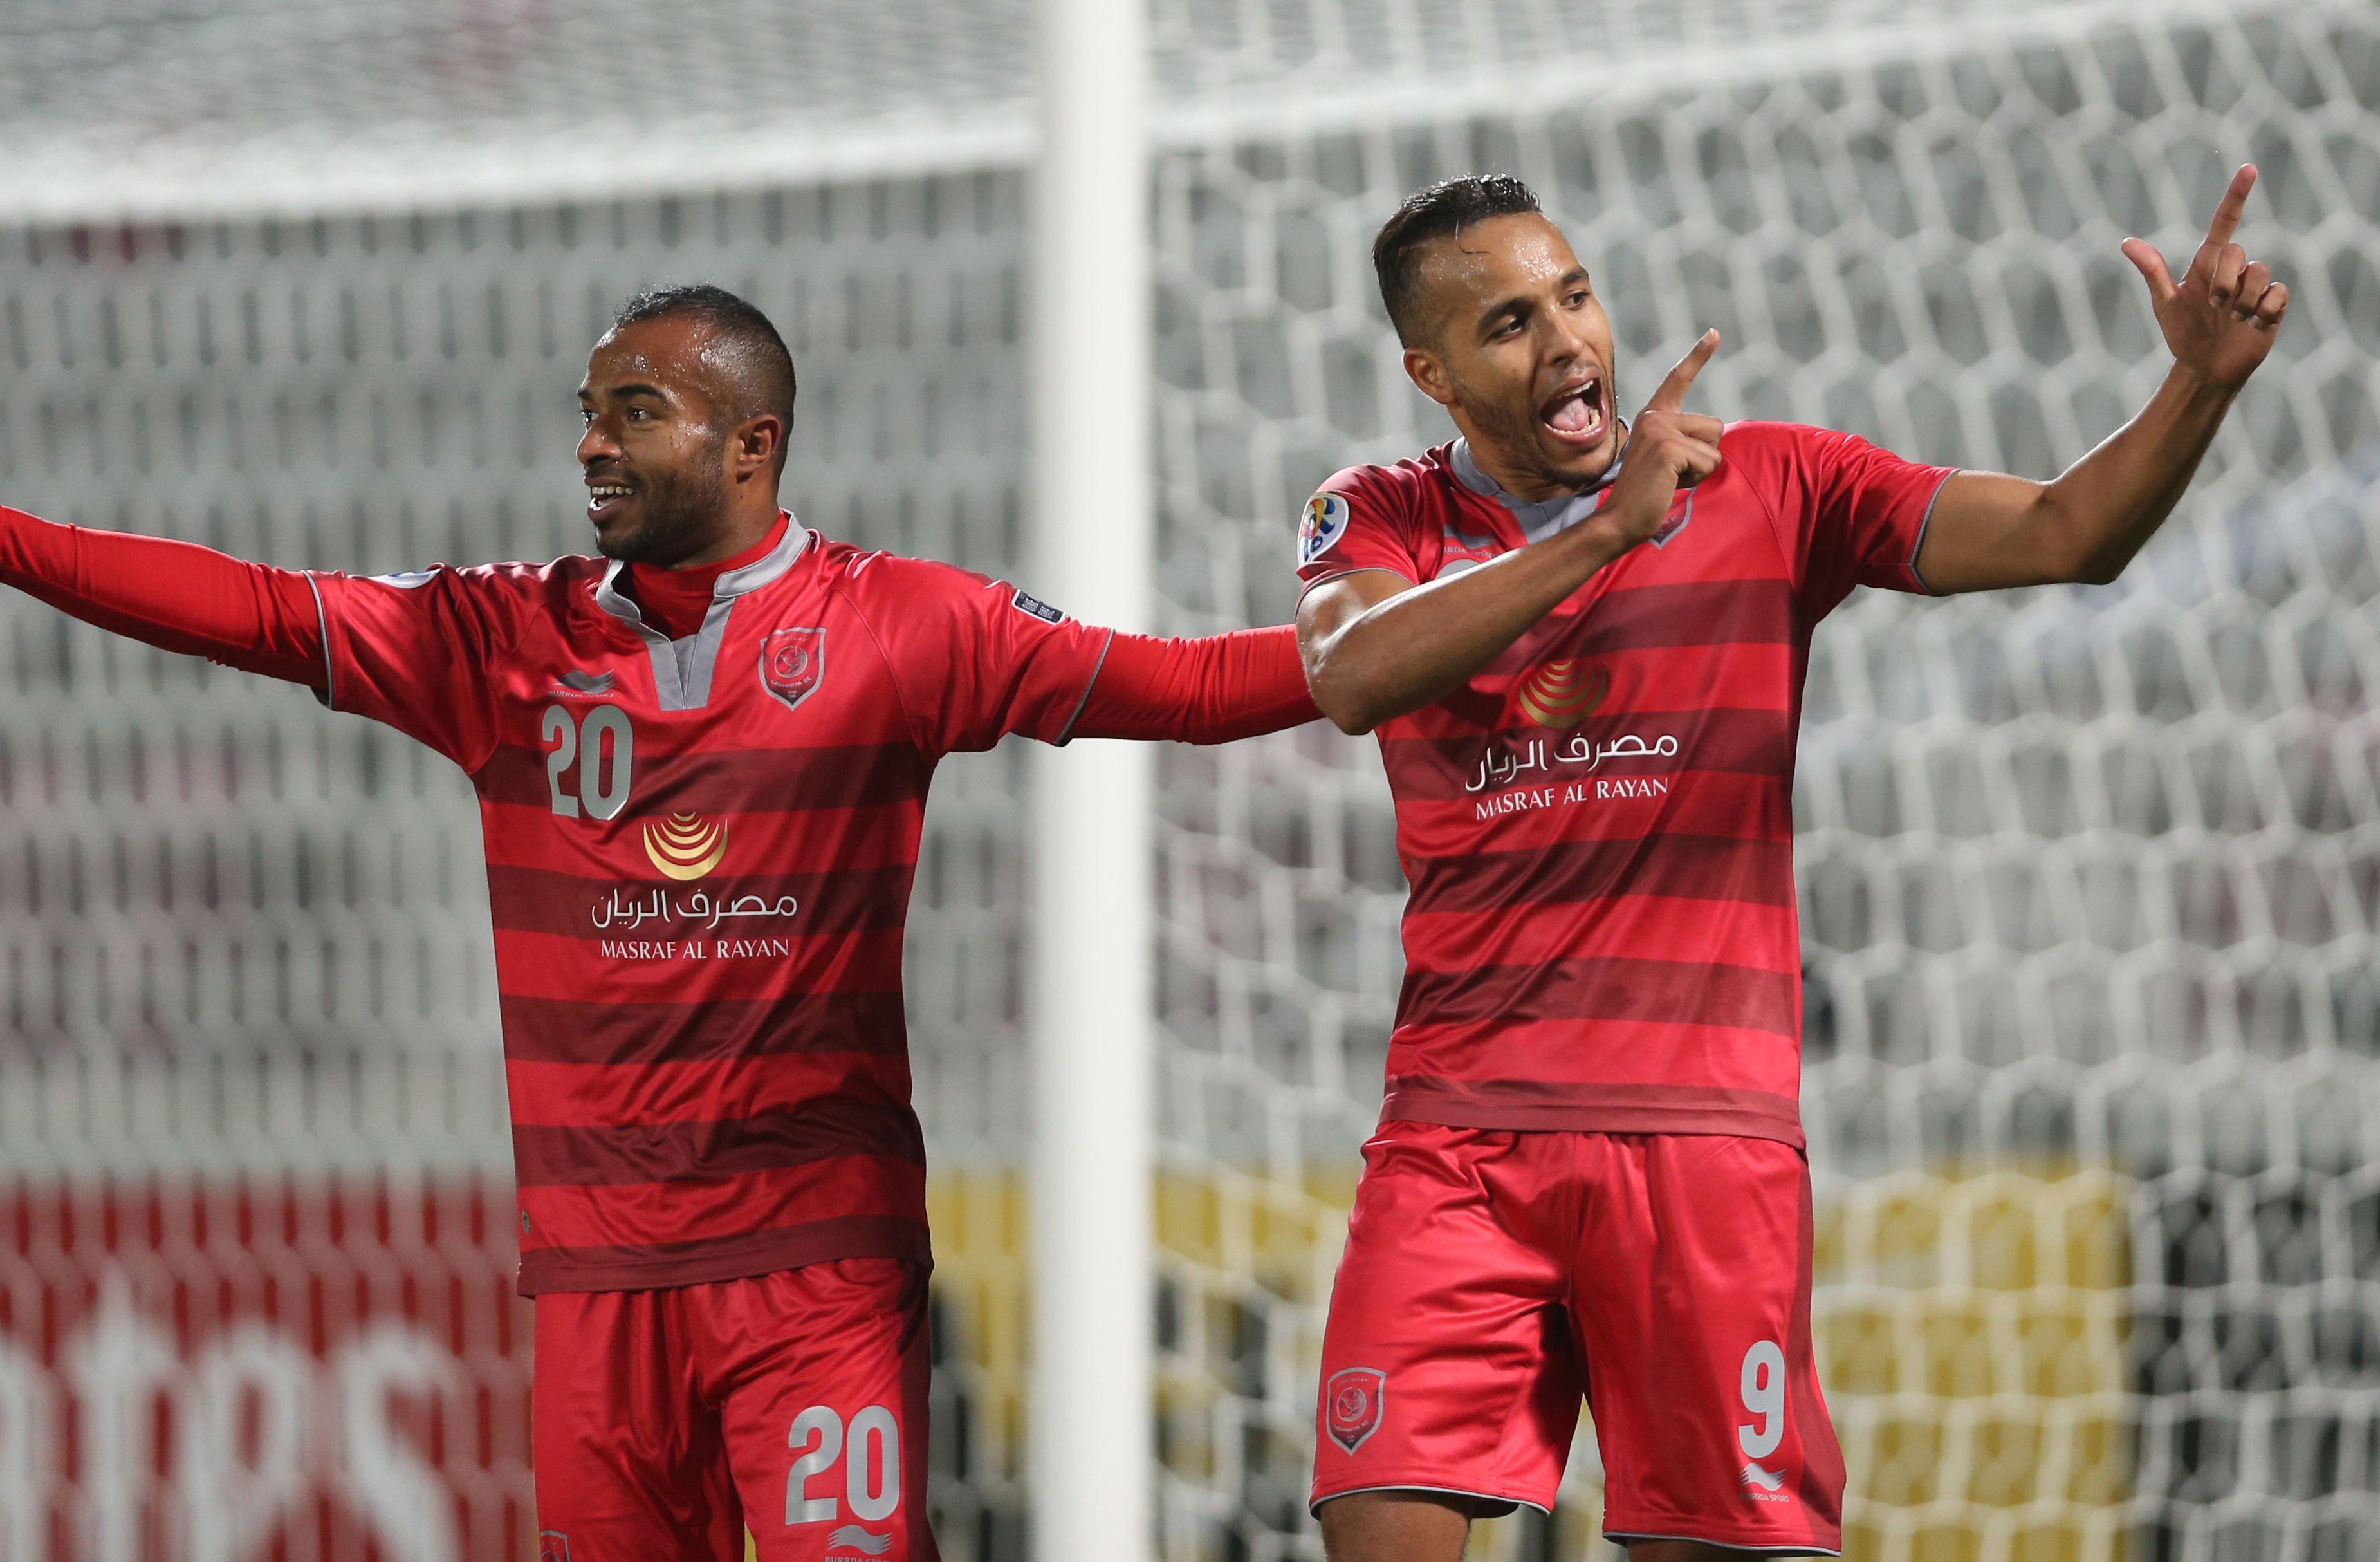 Qatar's Lekhwiya players Ali Hassan Afif (L) and Youssef El-Arabi celebrate